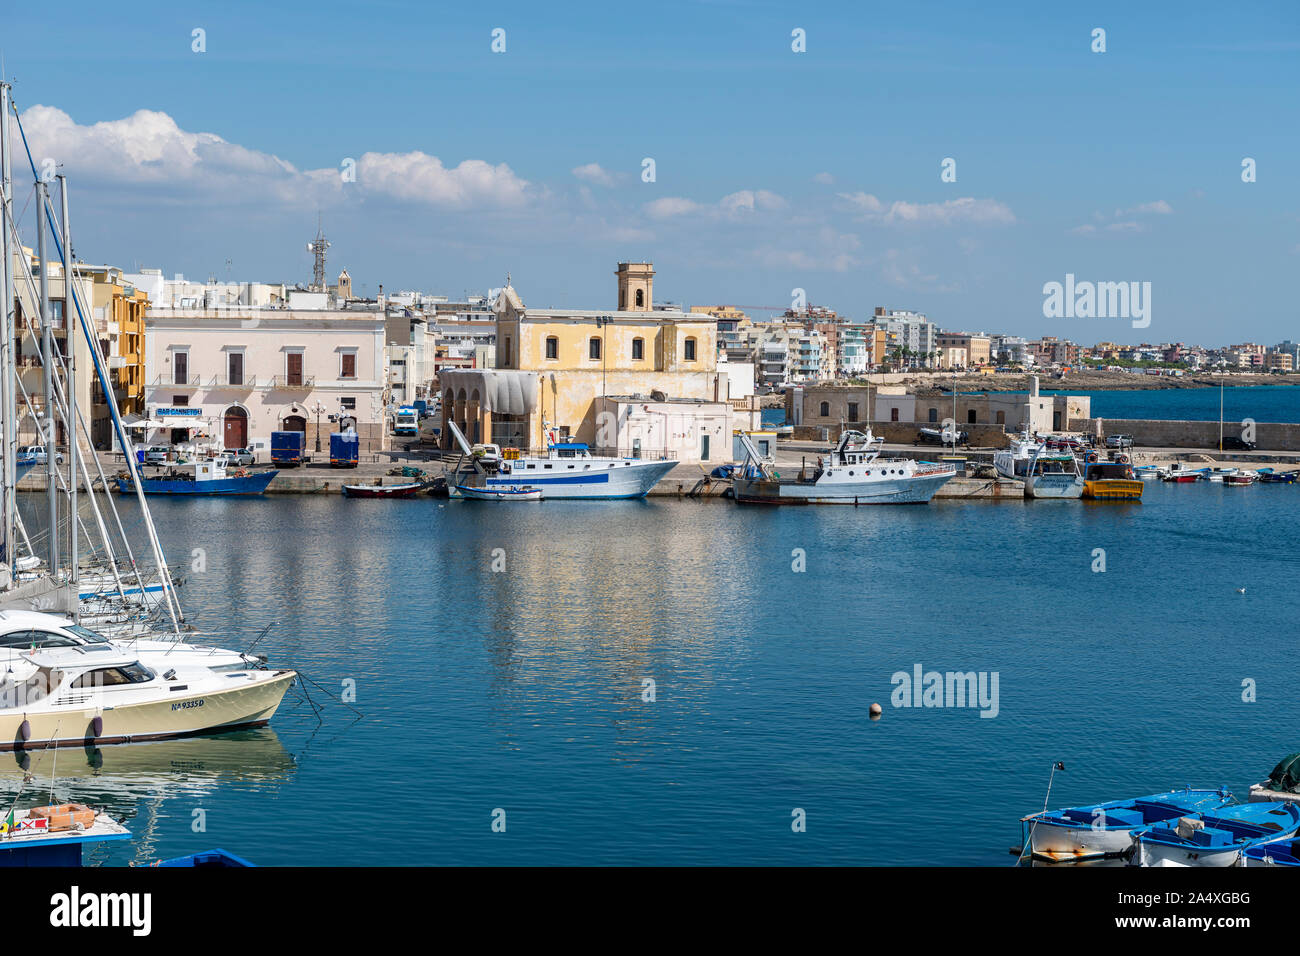 View across harbour to Chiesa di Santa Maria del Canneto (Church of Saint Mary) in Gallipoli, Apulia (Puglia) in Southern Italy Stock Photo